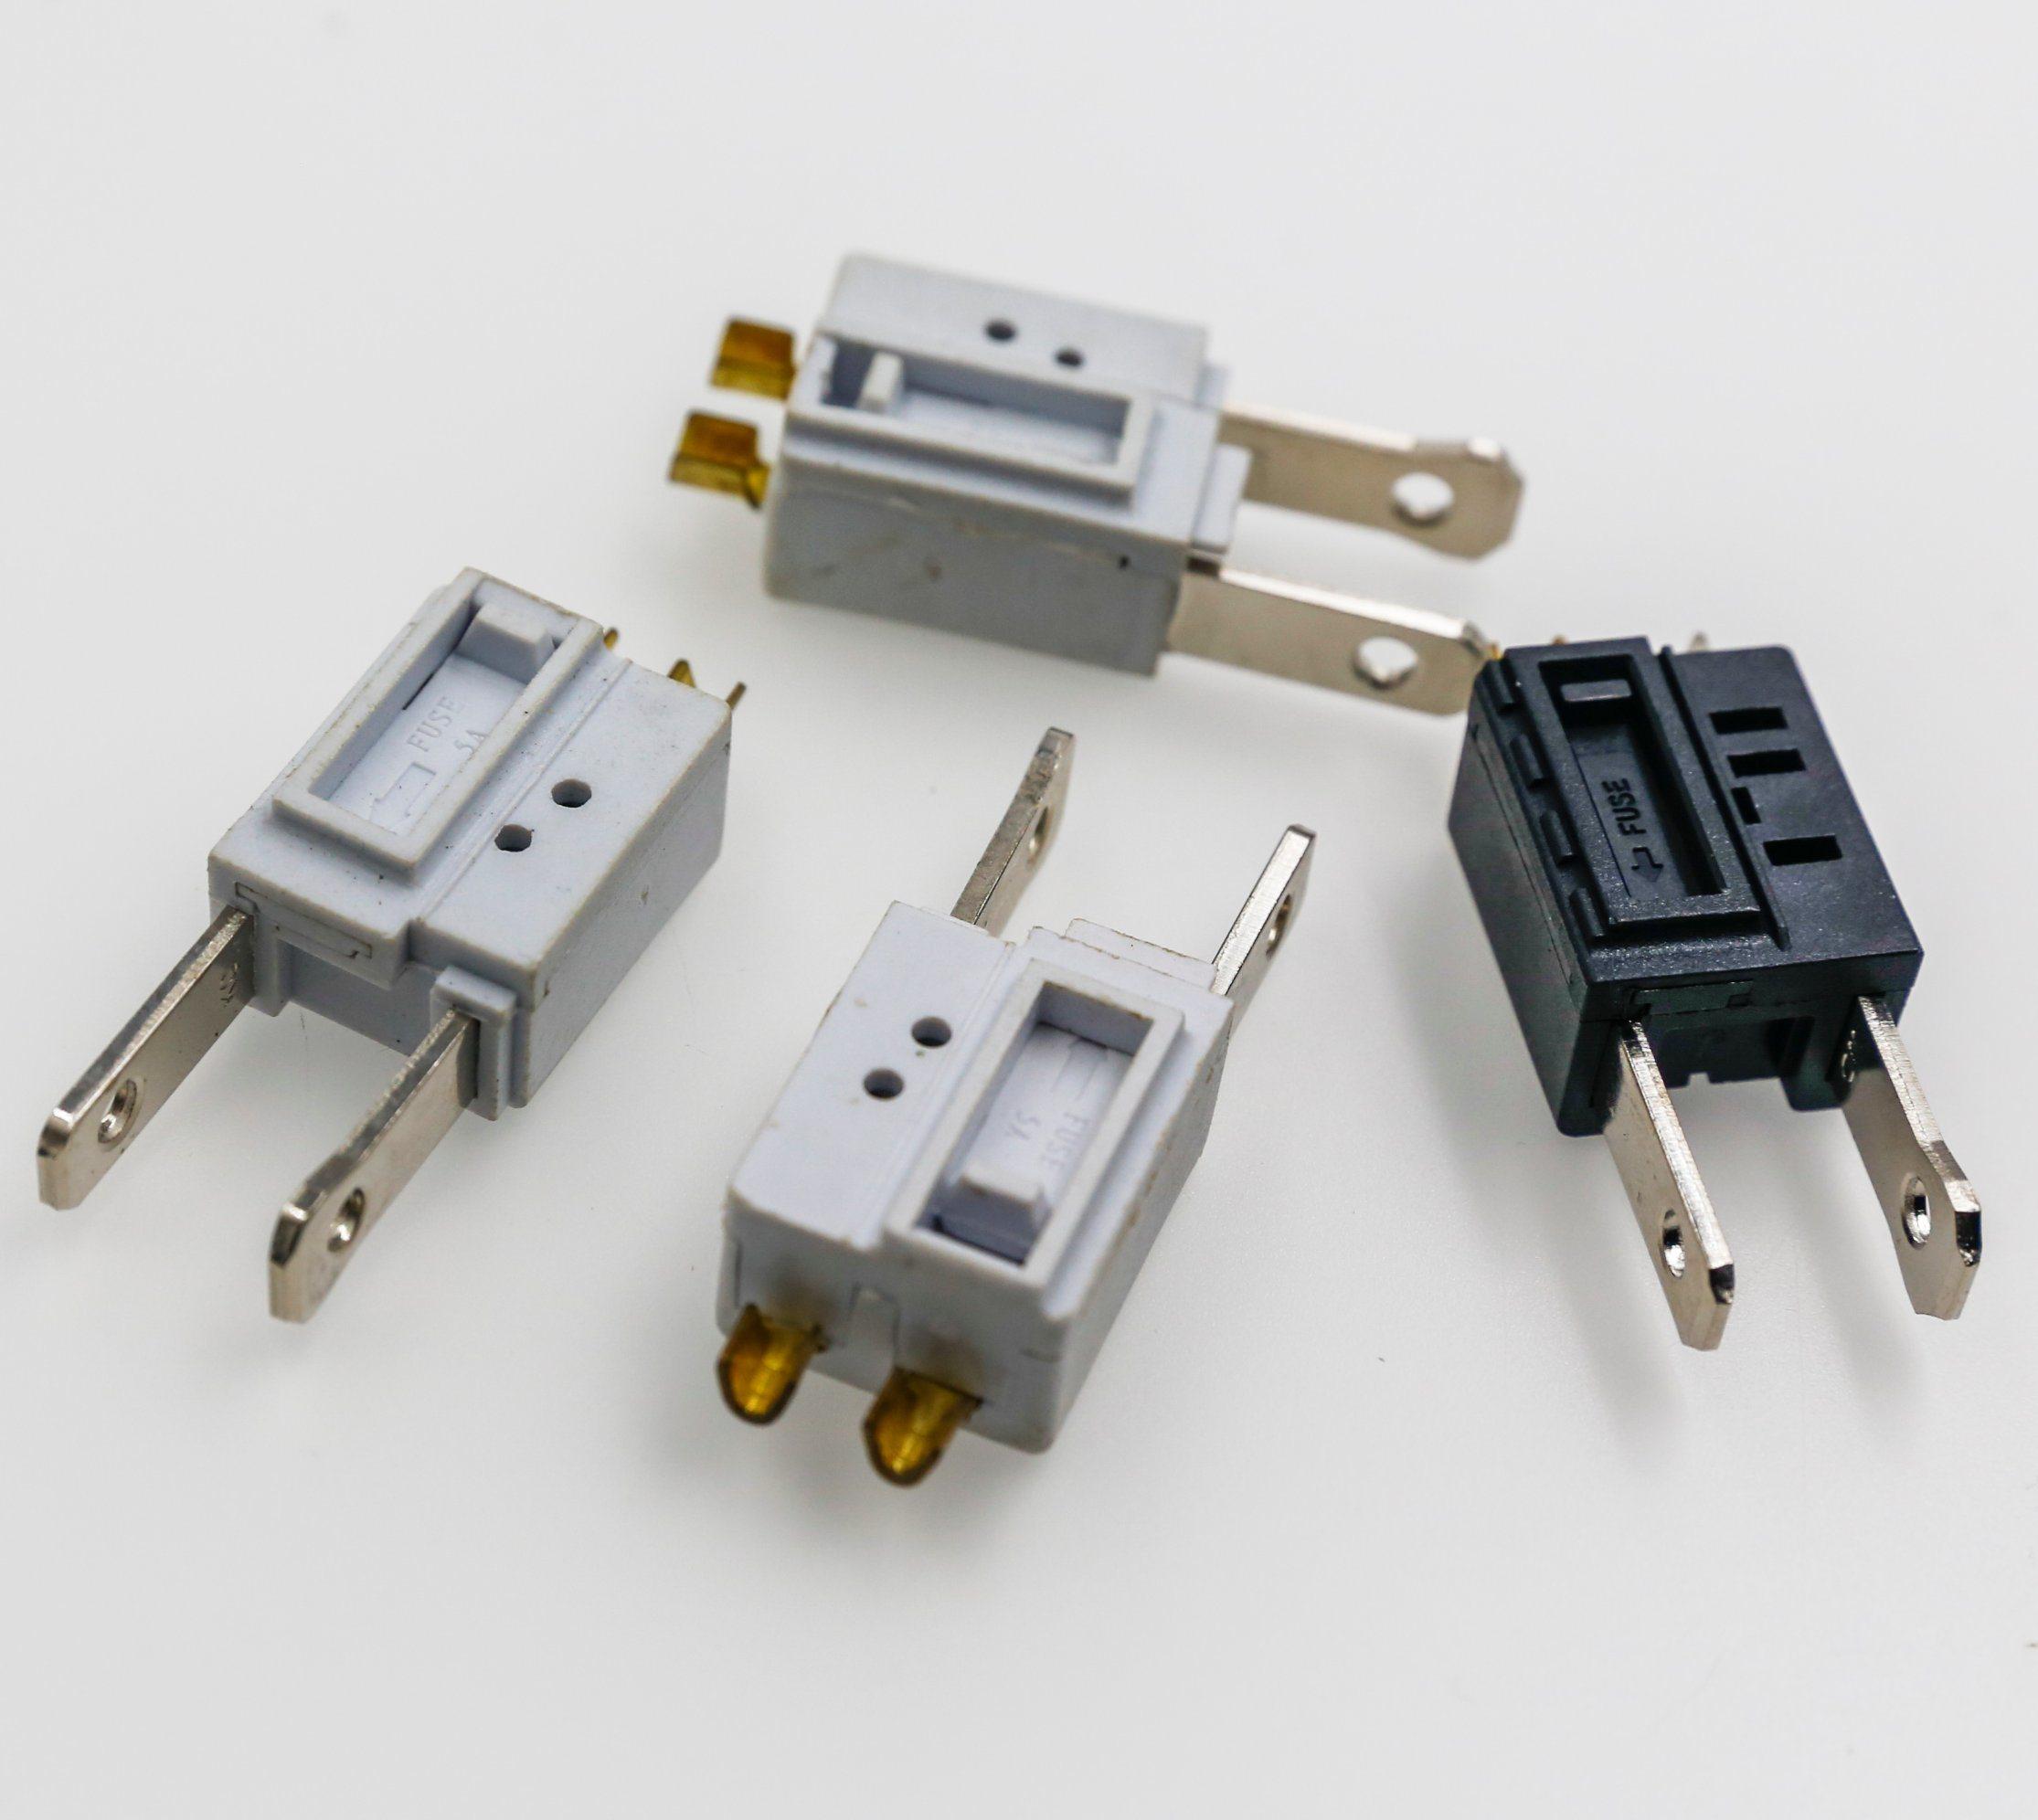 Plug Insert NEMA Plug Inserts Fuse with - China Insert